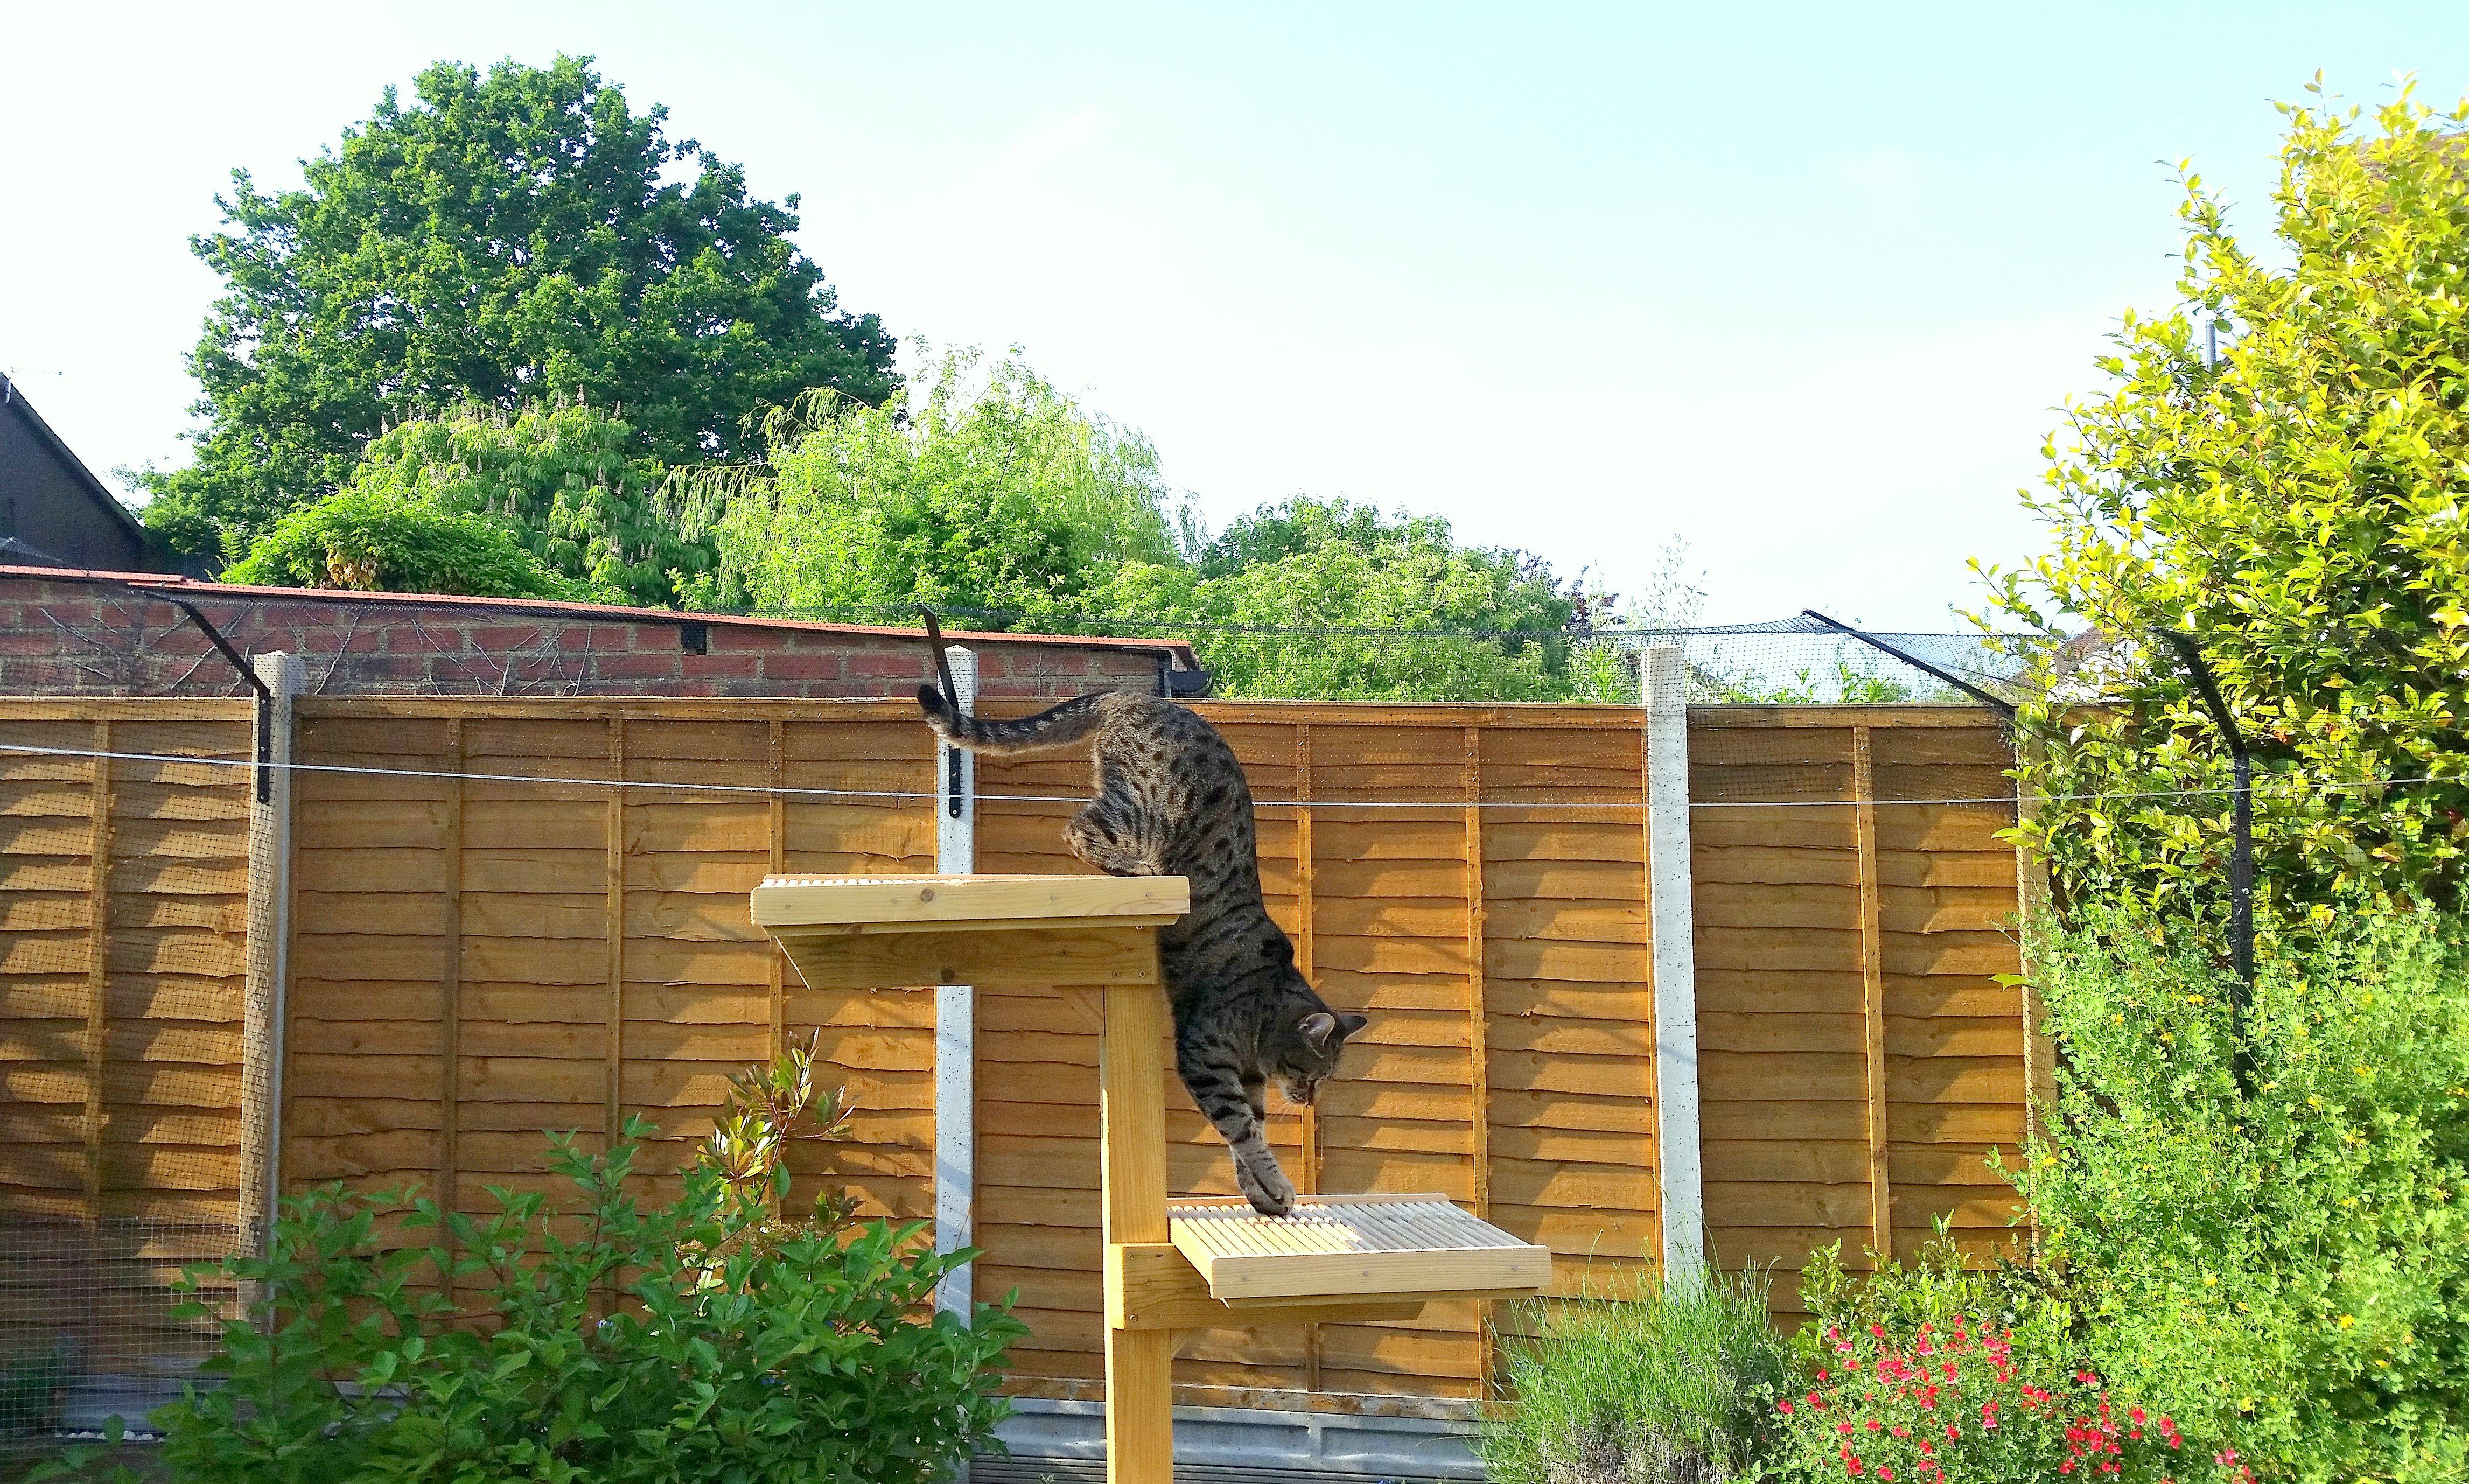 My cat enjoying his outside cat enclosure